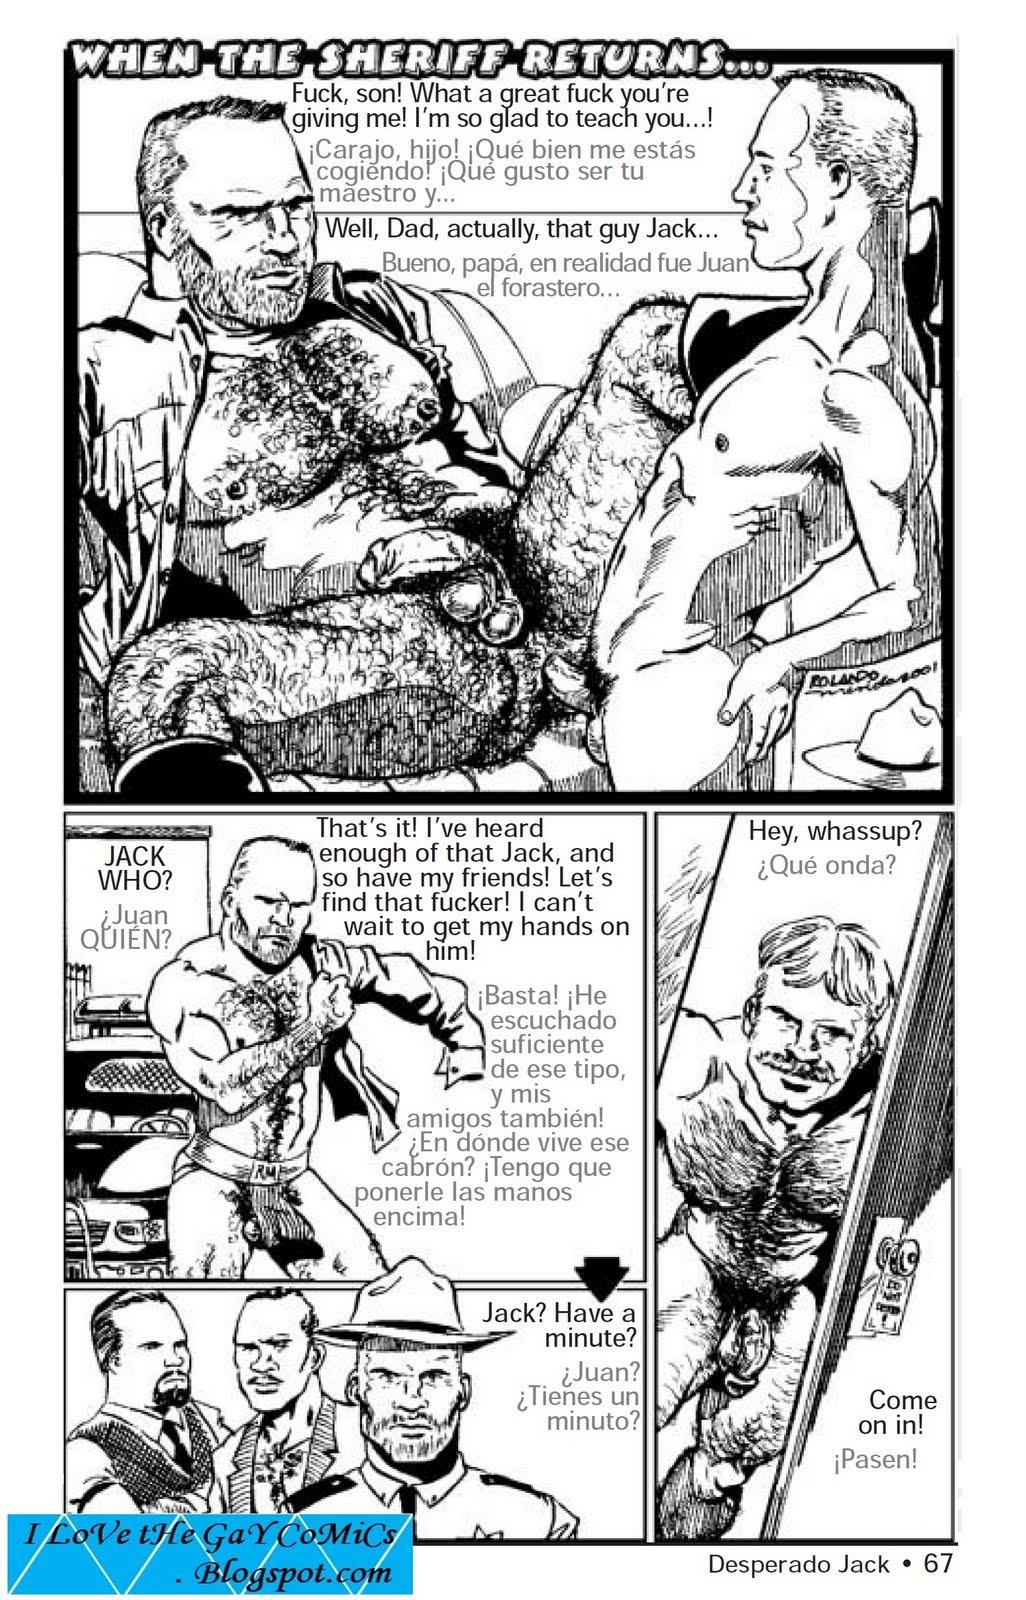 rolando merida comics new